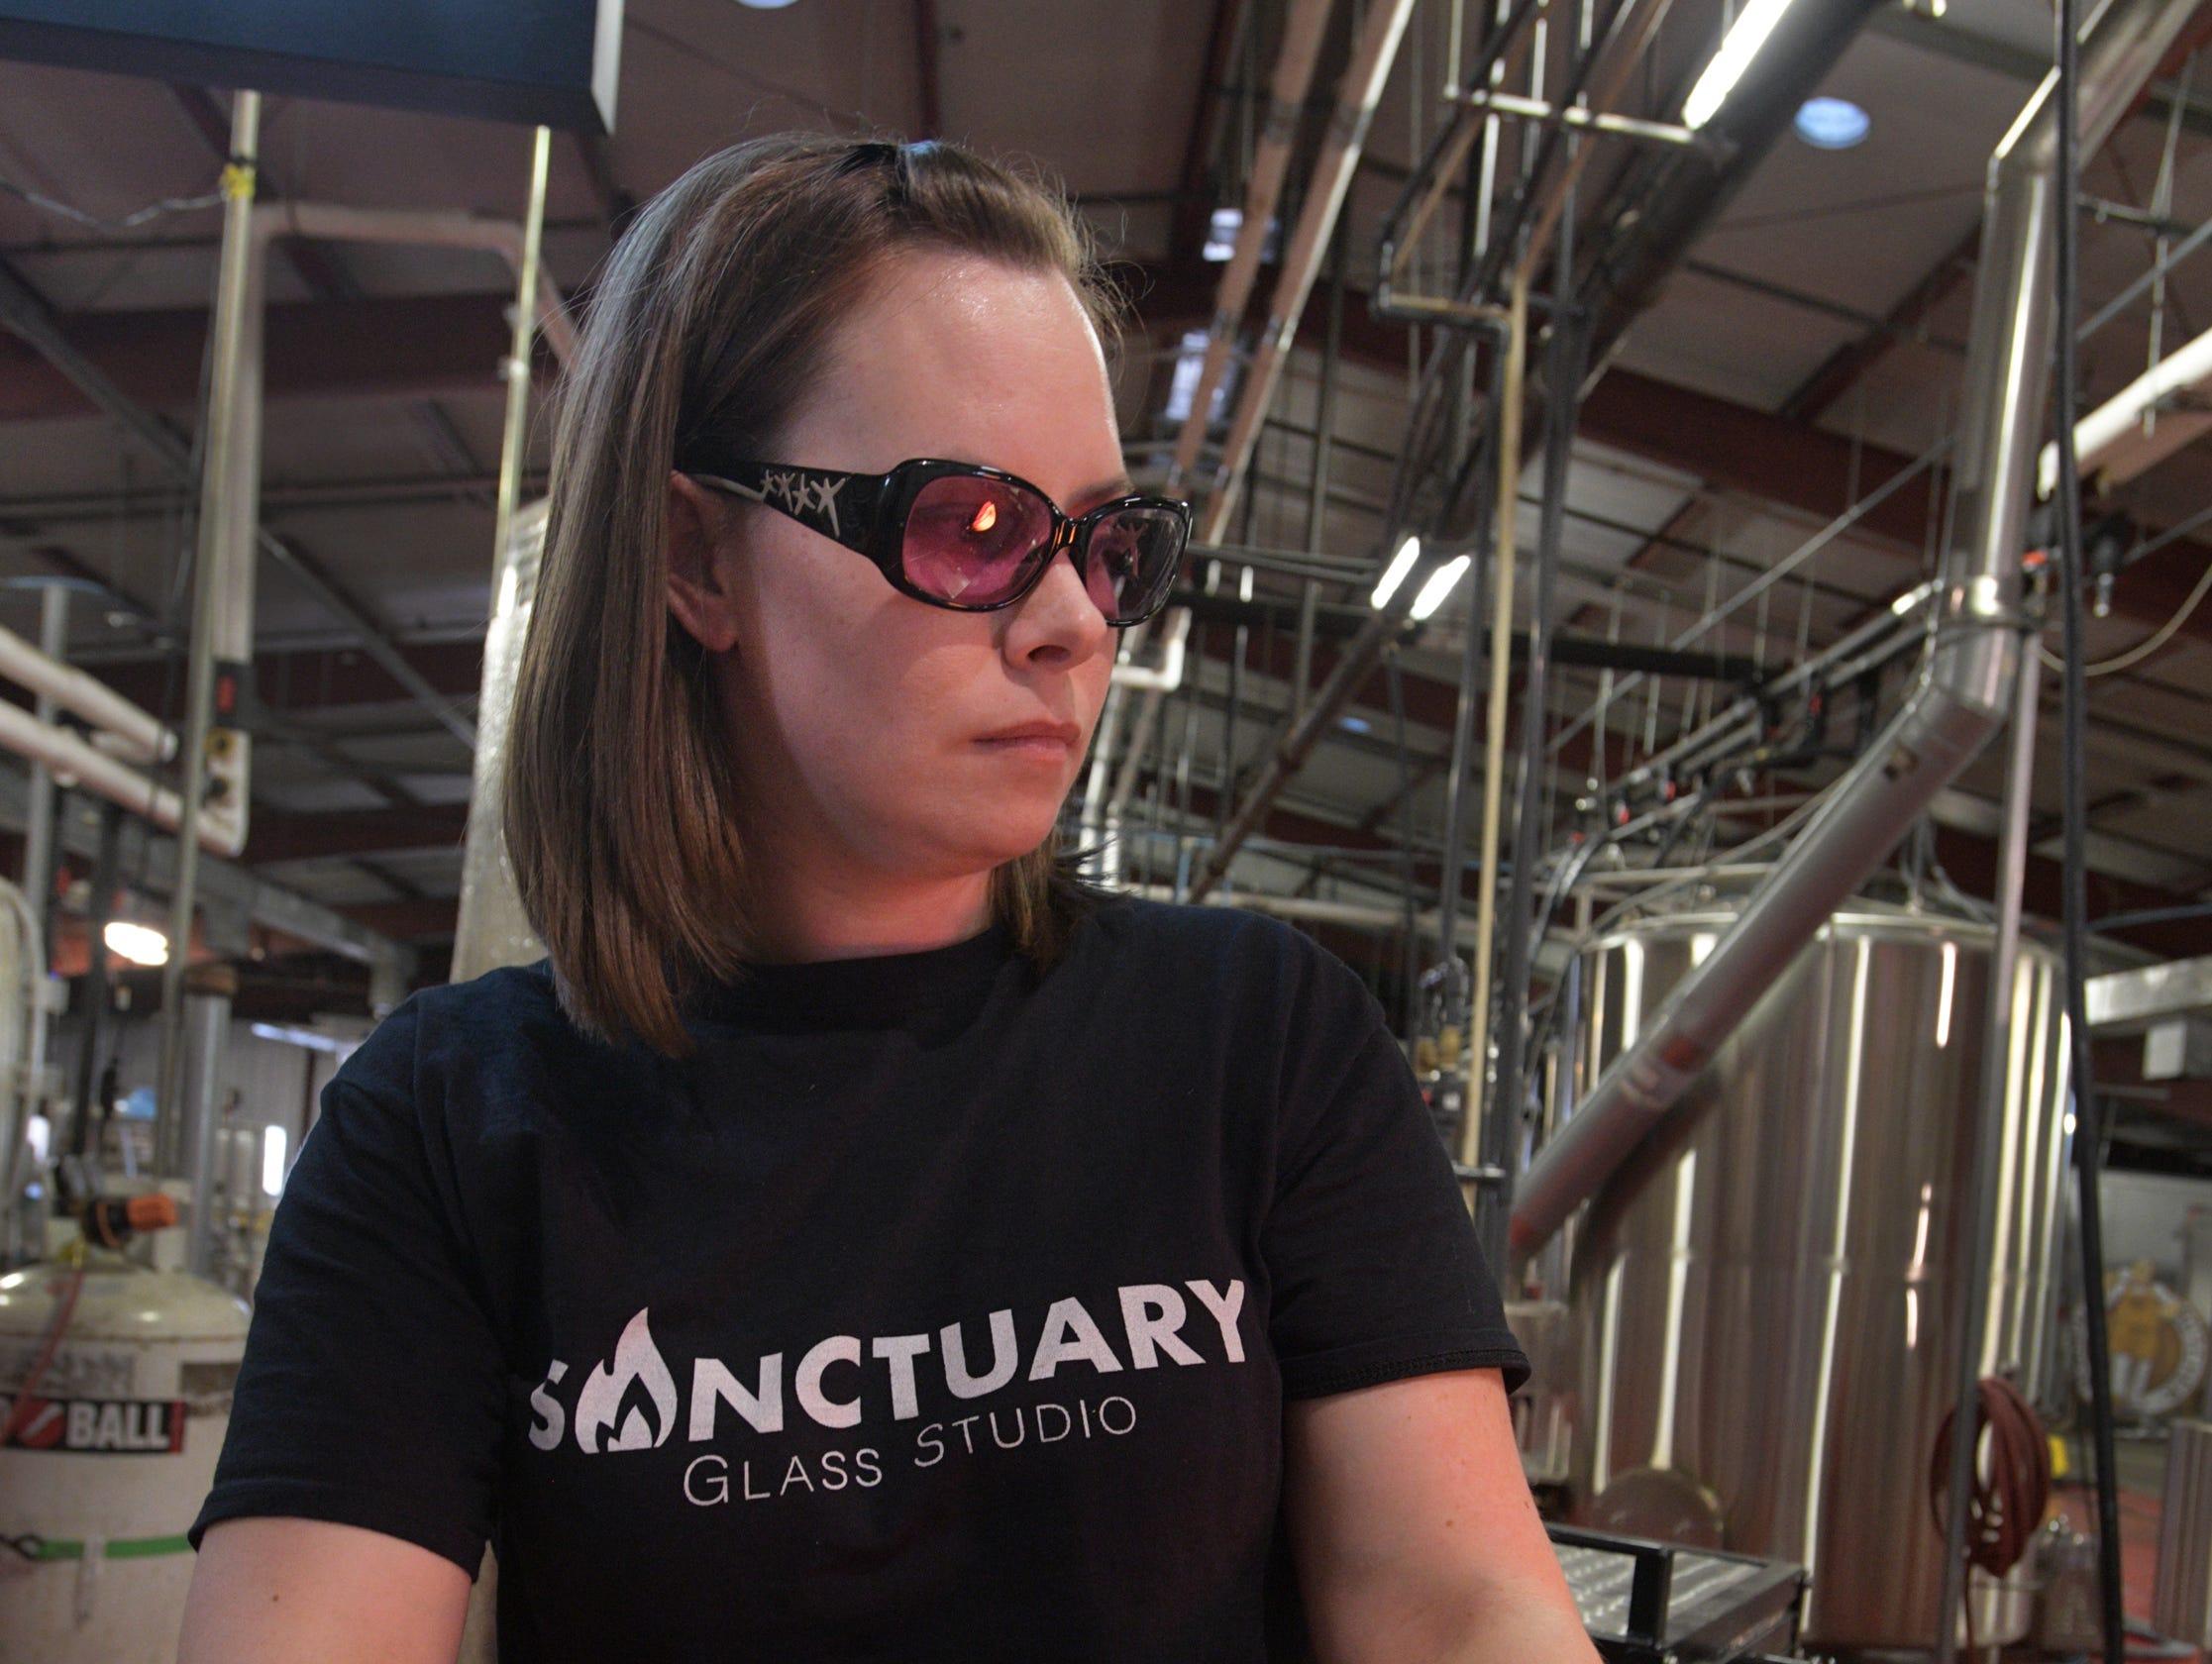 Sanctuary Glass Studio co-owner Michelle Pennington works with molten glass.